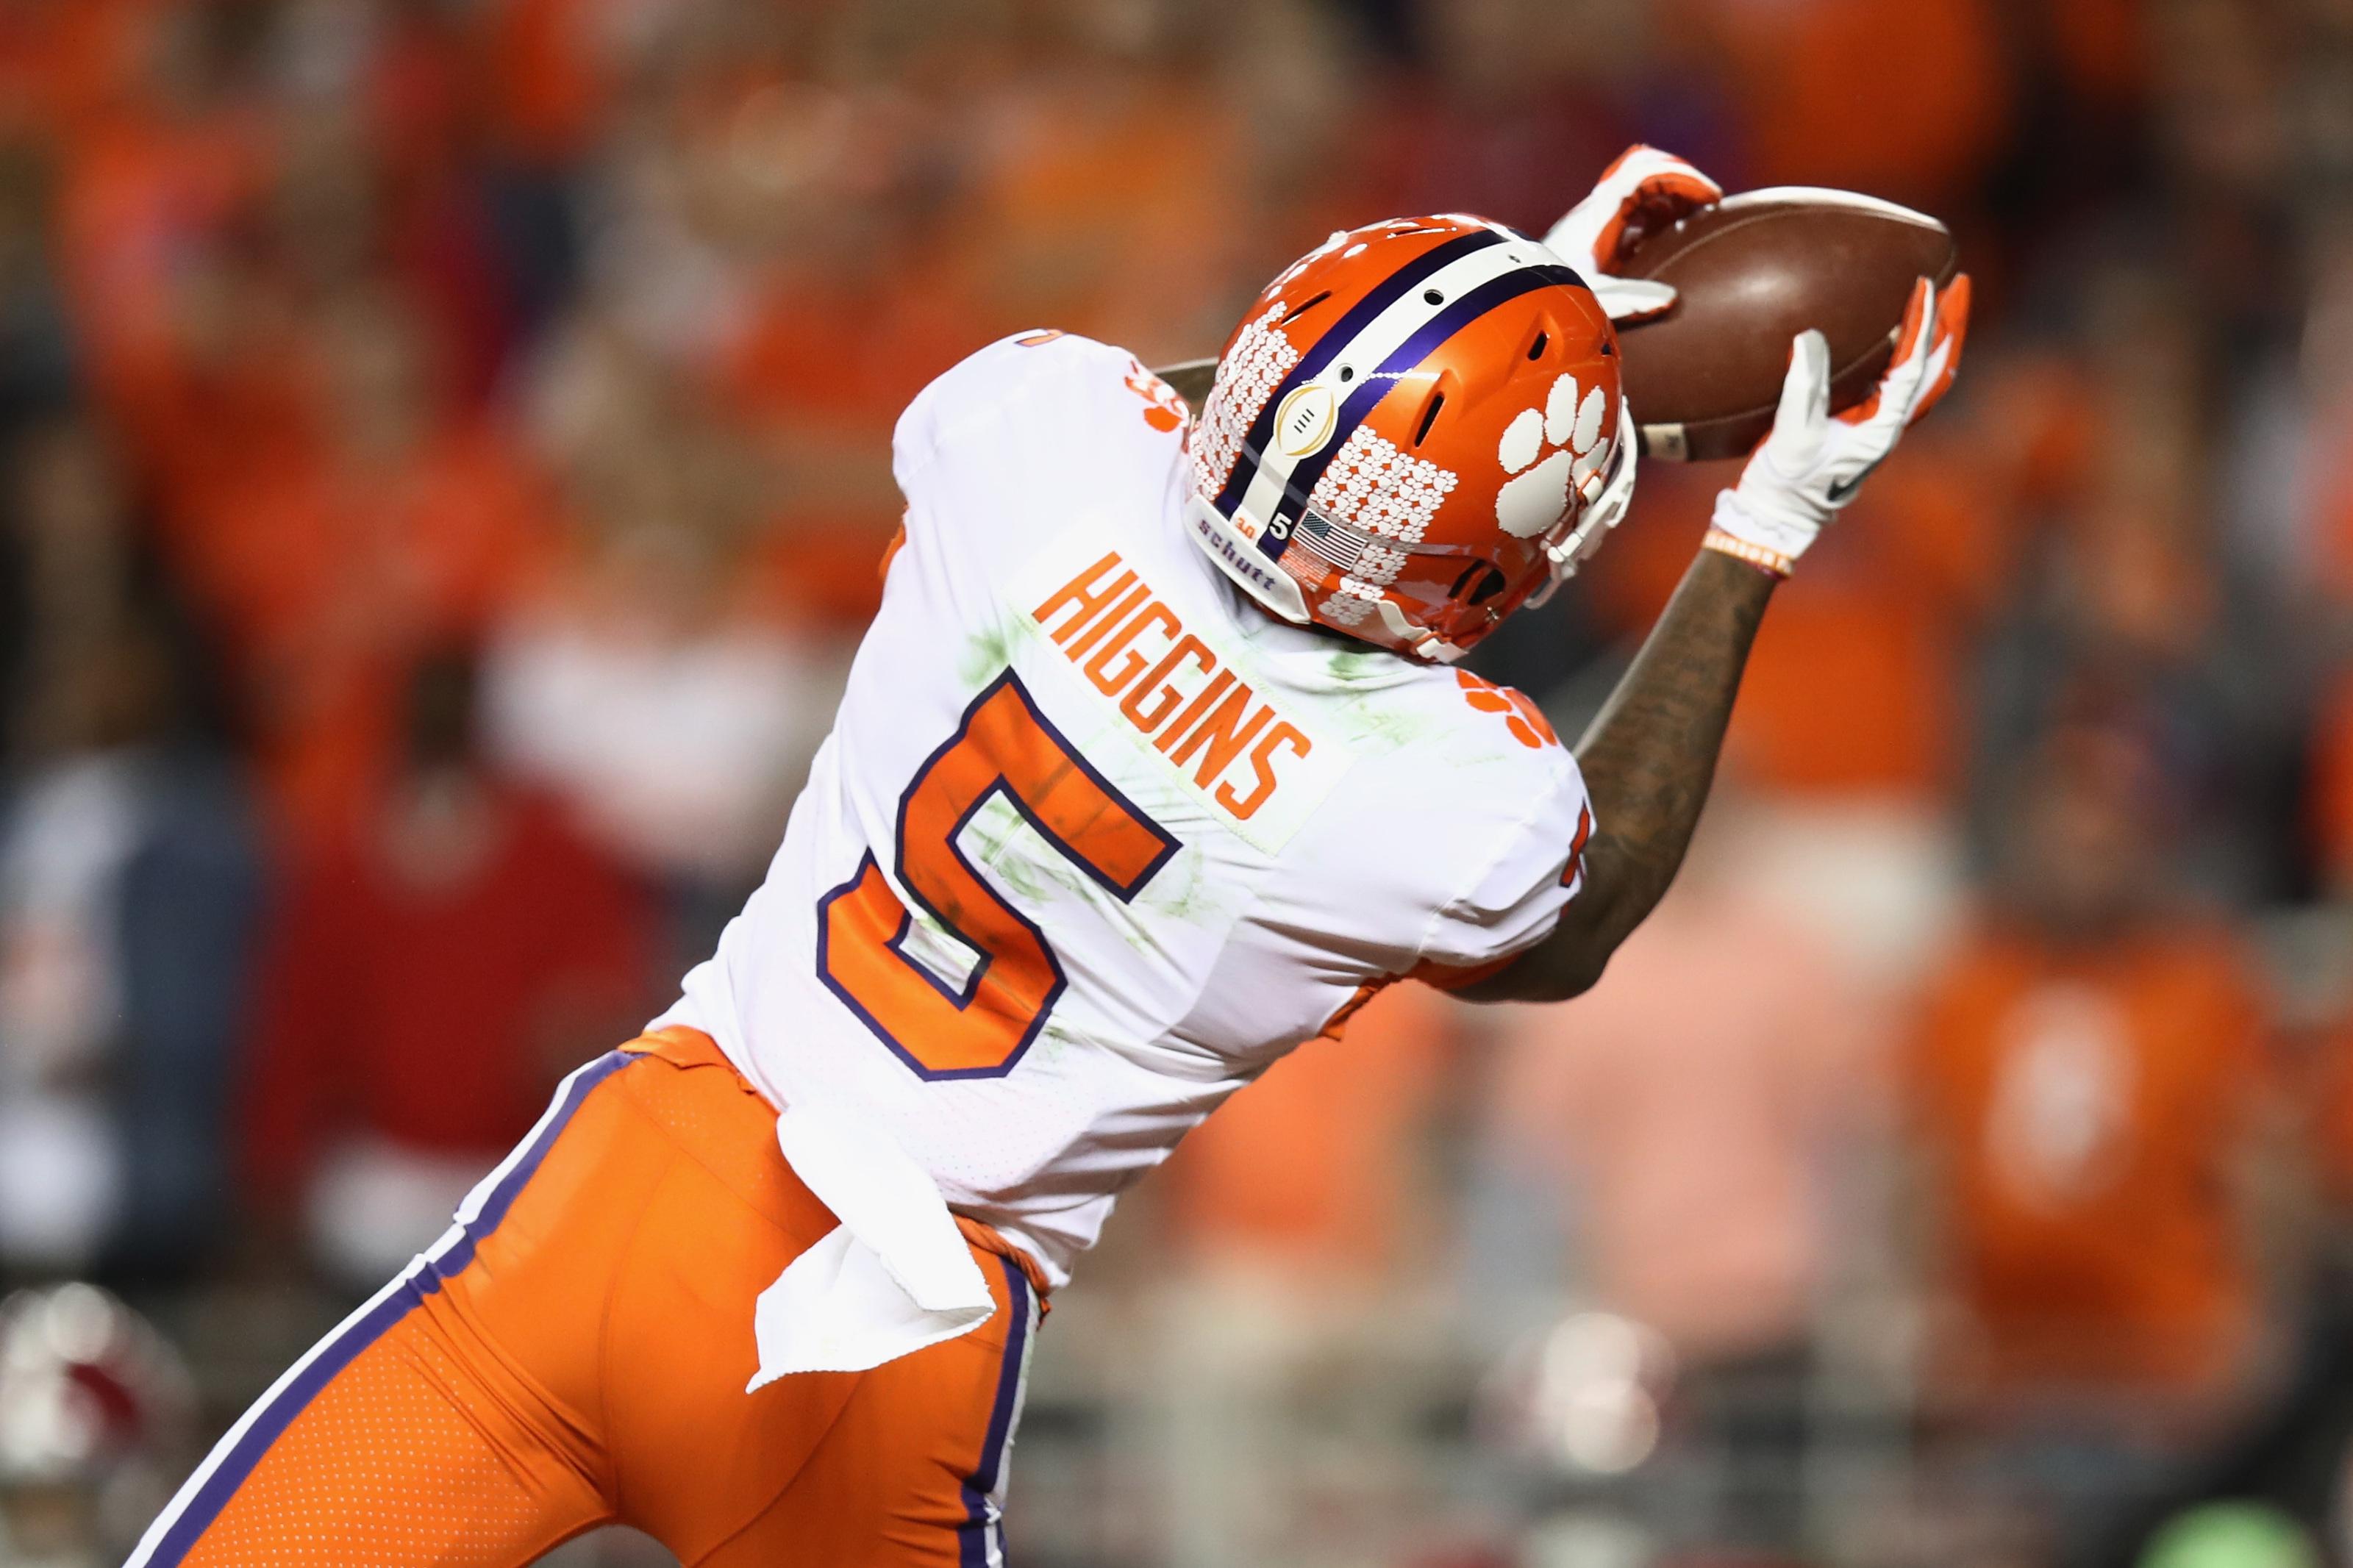 2020 NFL Draft: Clemson wide receiver Tee Higgins scouting report